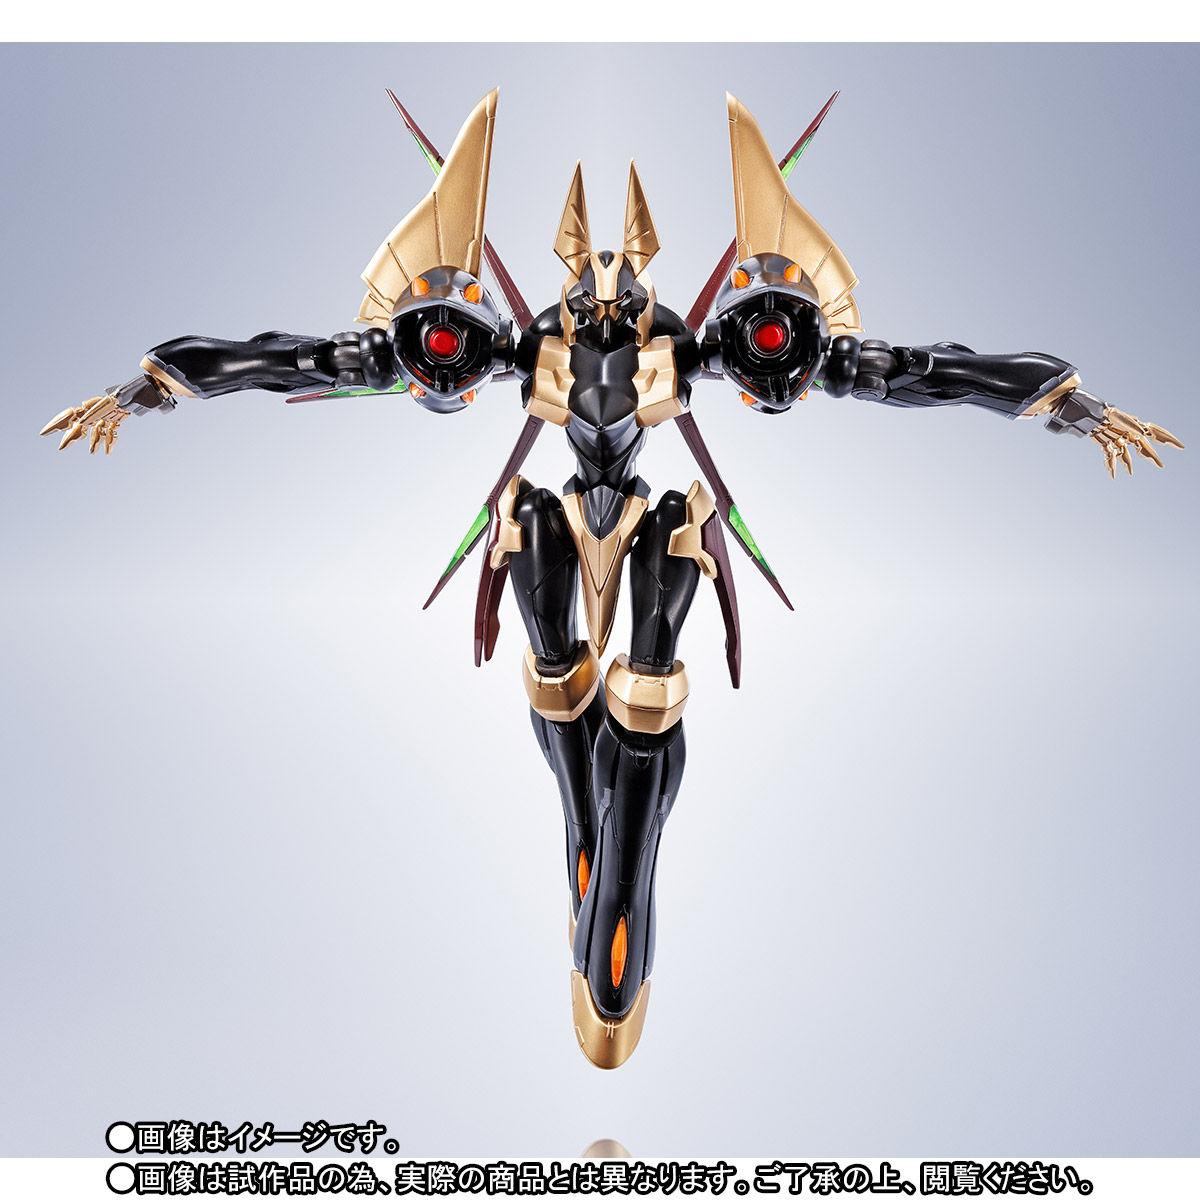 ROBOT魂〈SIDE KMF〉『ガウェイン ~BLACK REBELLION~』コードギアス 可動フィギュア-008